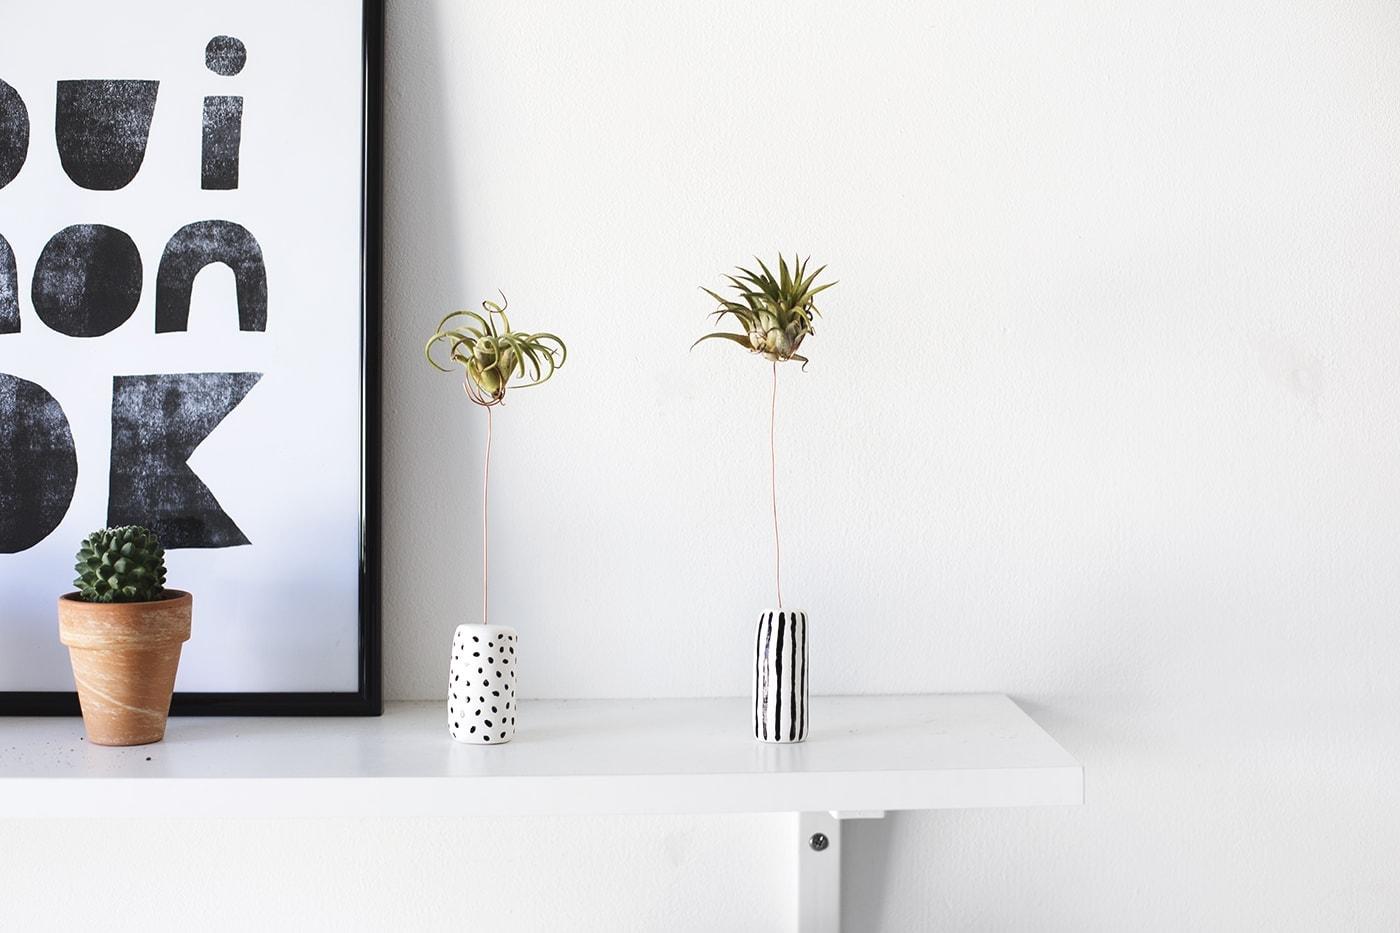 DIY clay air planter holders | easy craft tutorial